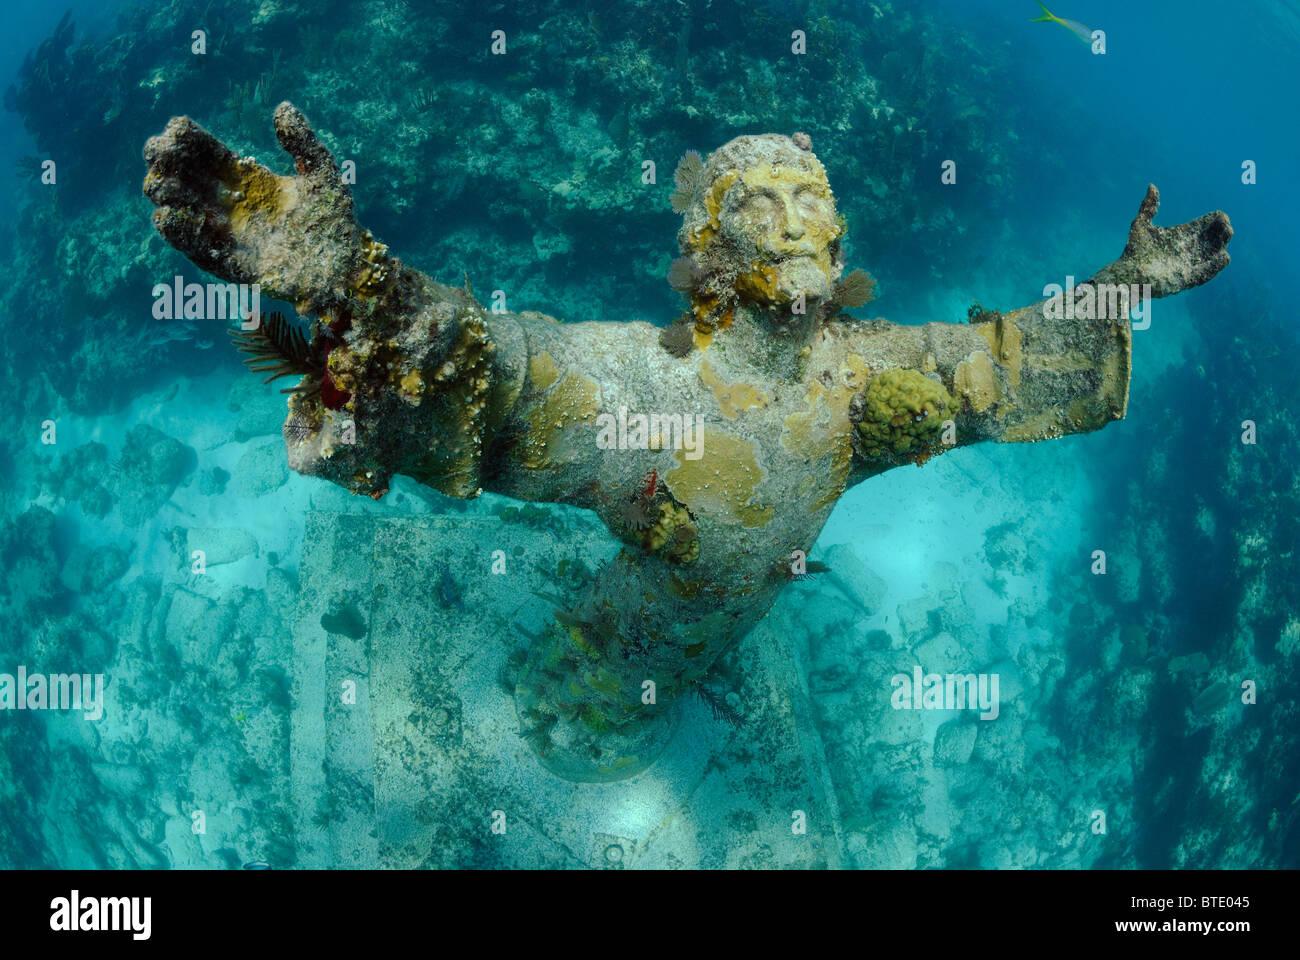 Christ of the Abyss statue off Key Largo coast, Florida, USA Stock Photo